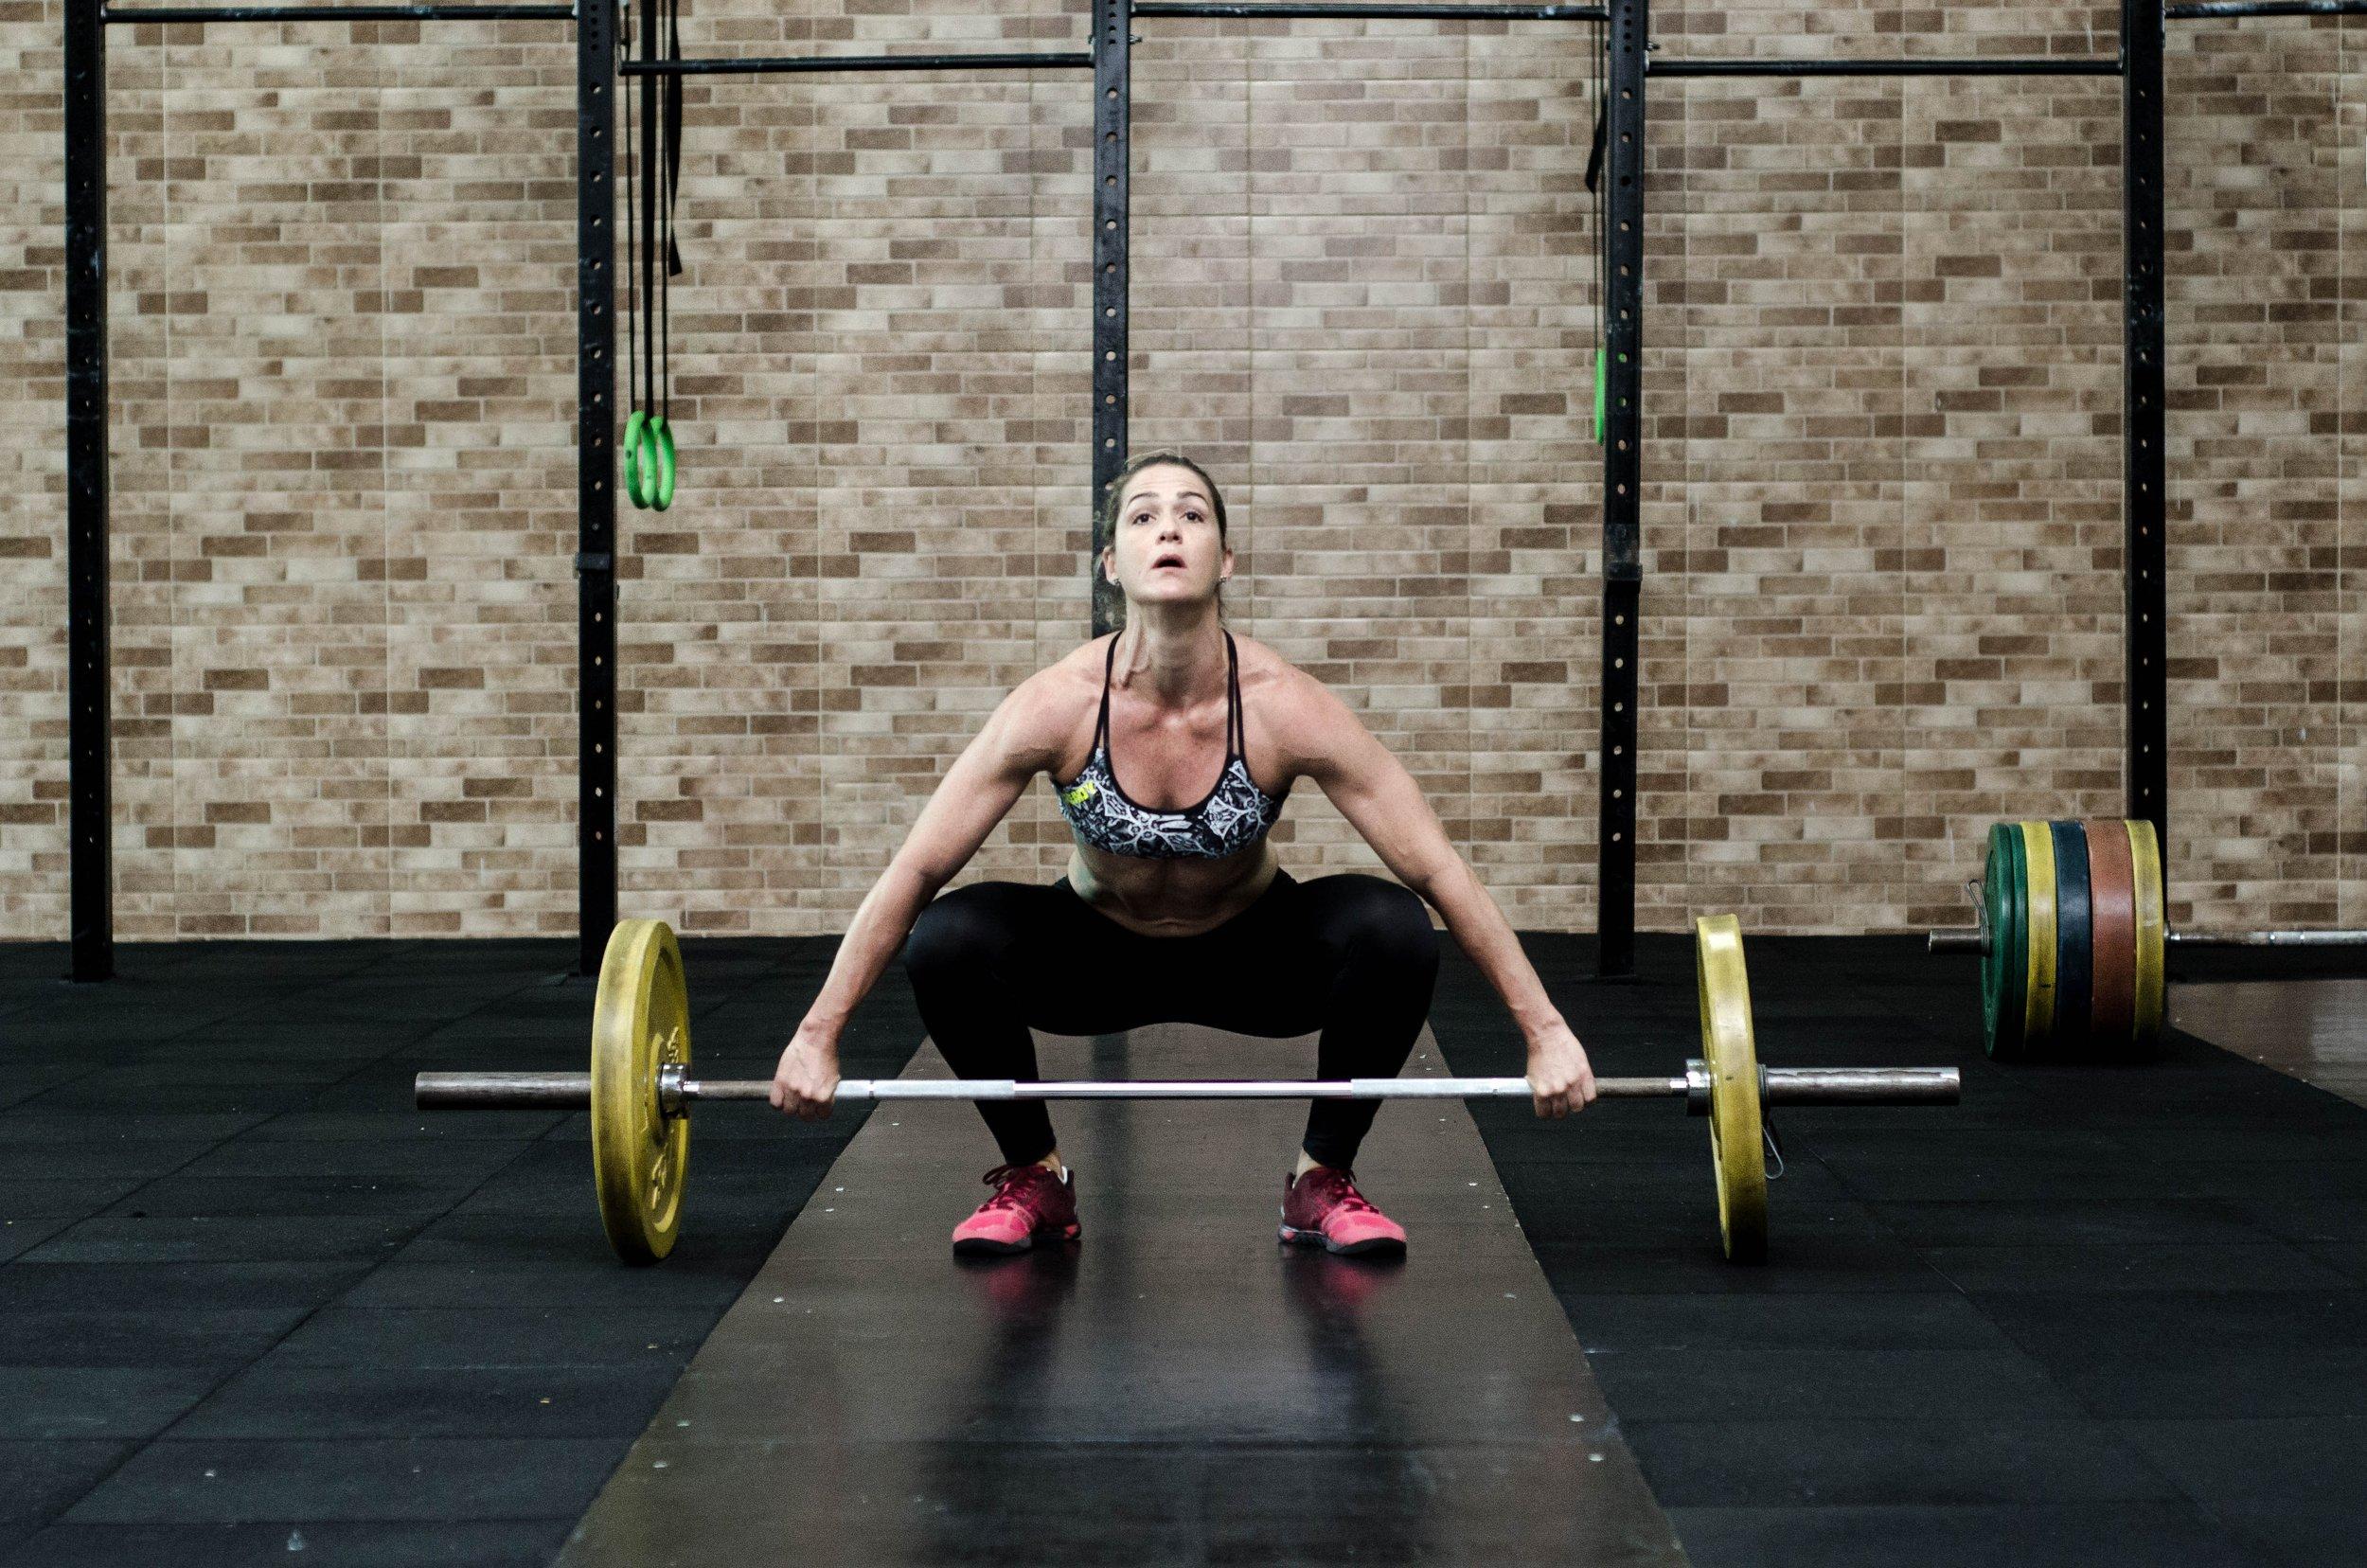 active-adult-athlete-348487.jpg